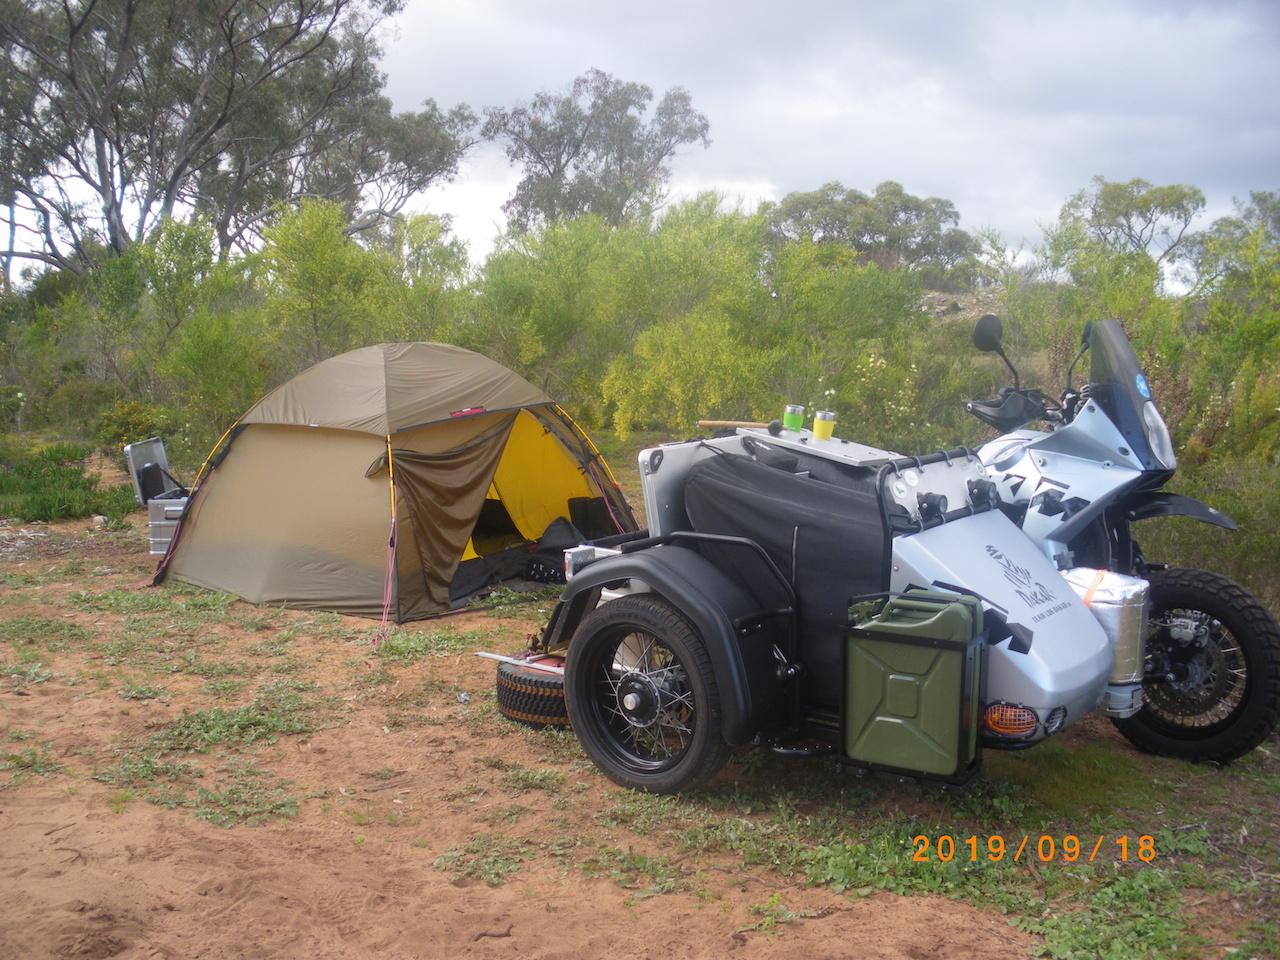 1e kamp in Woodridge 1 kopie.jpg